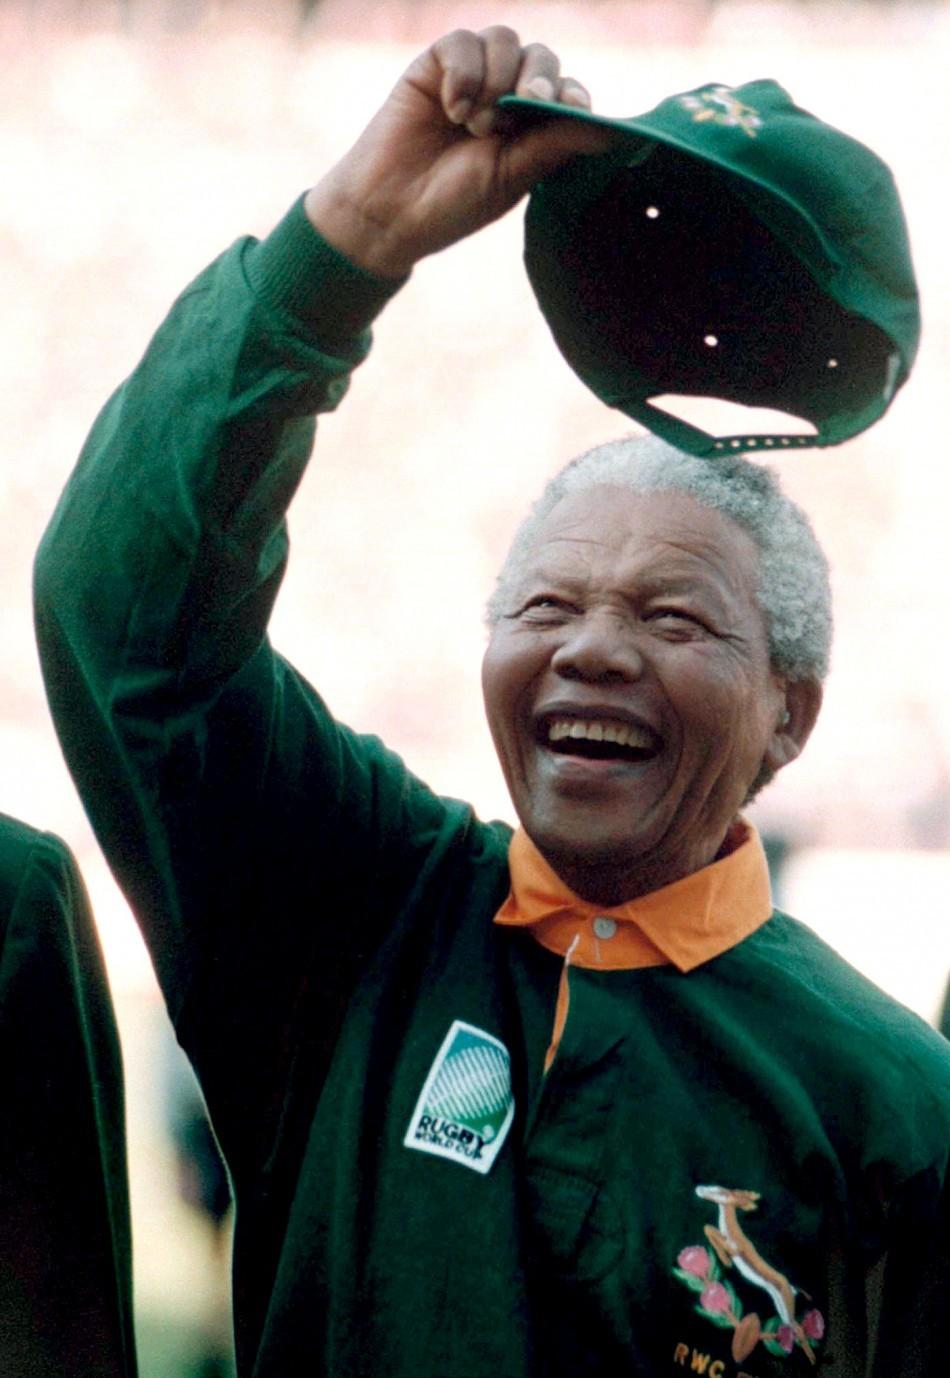 Springboks victory